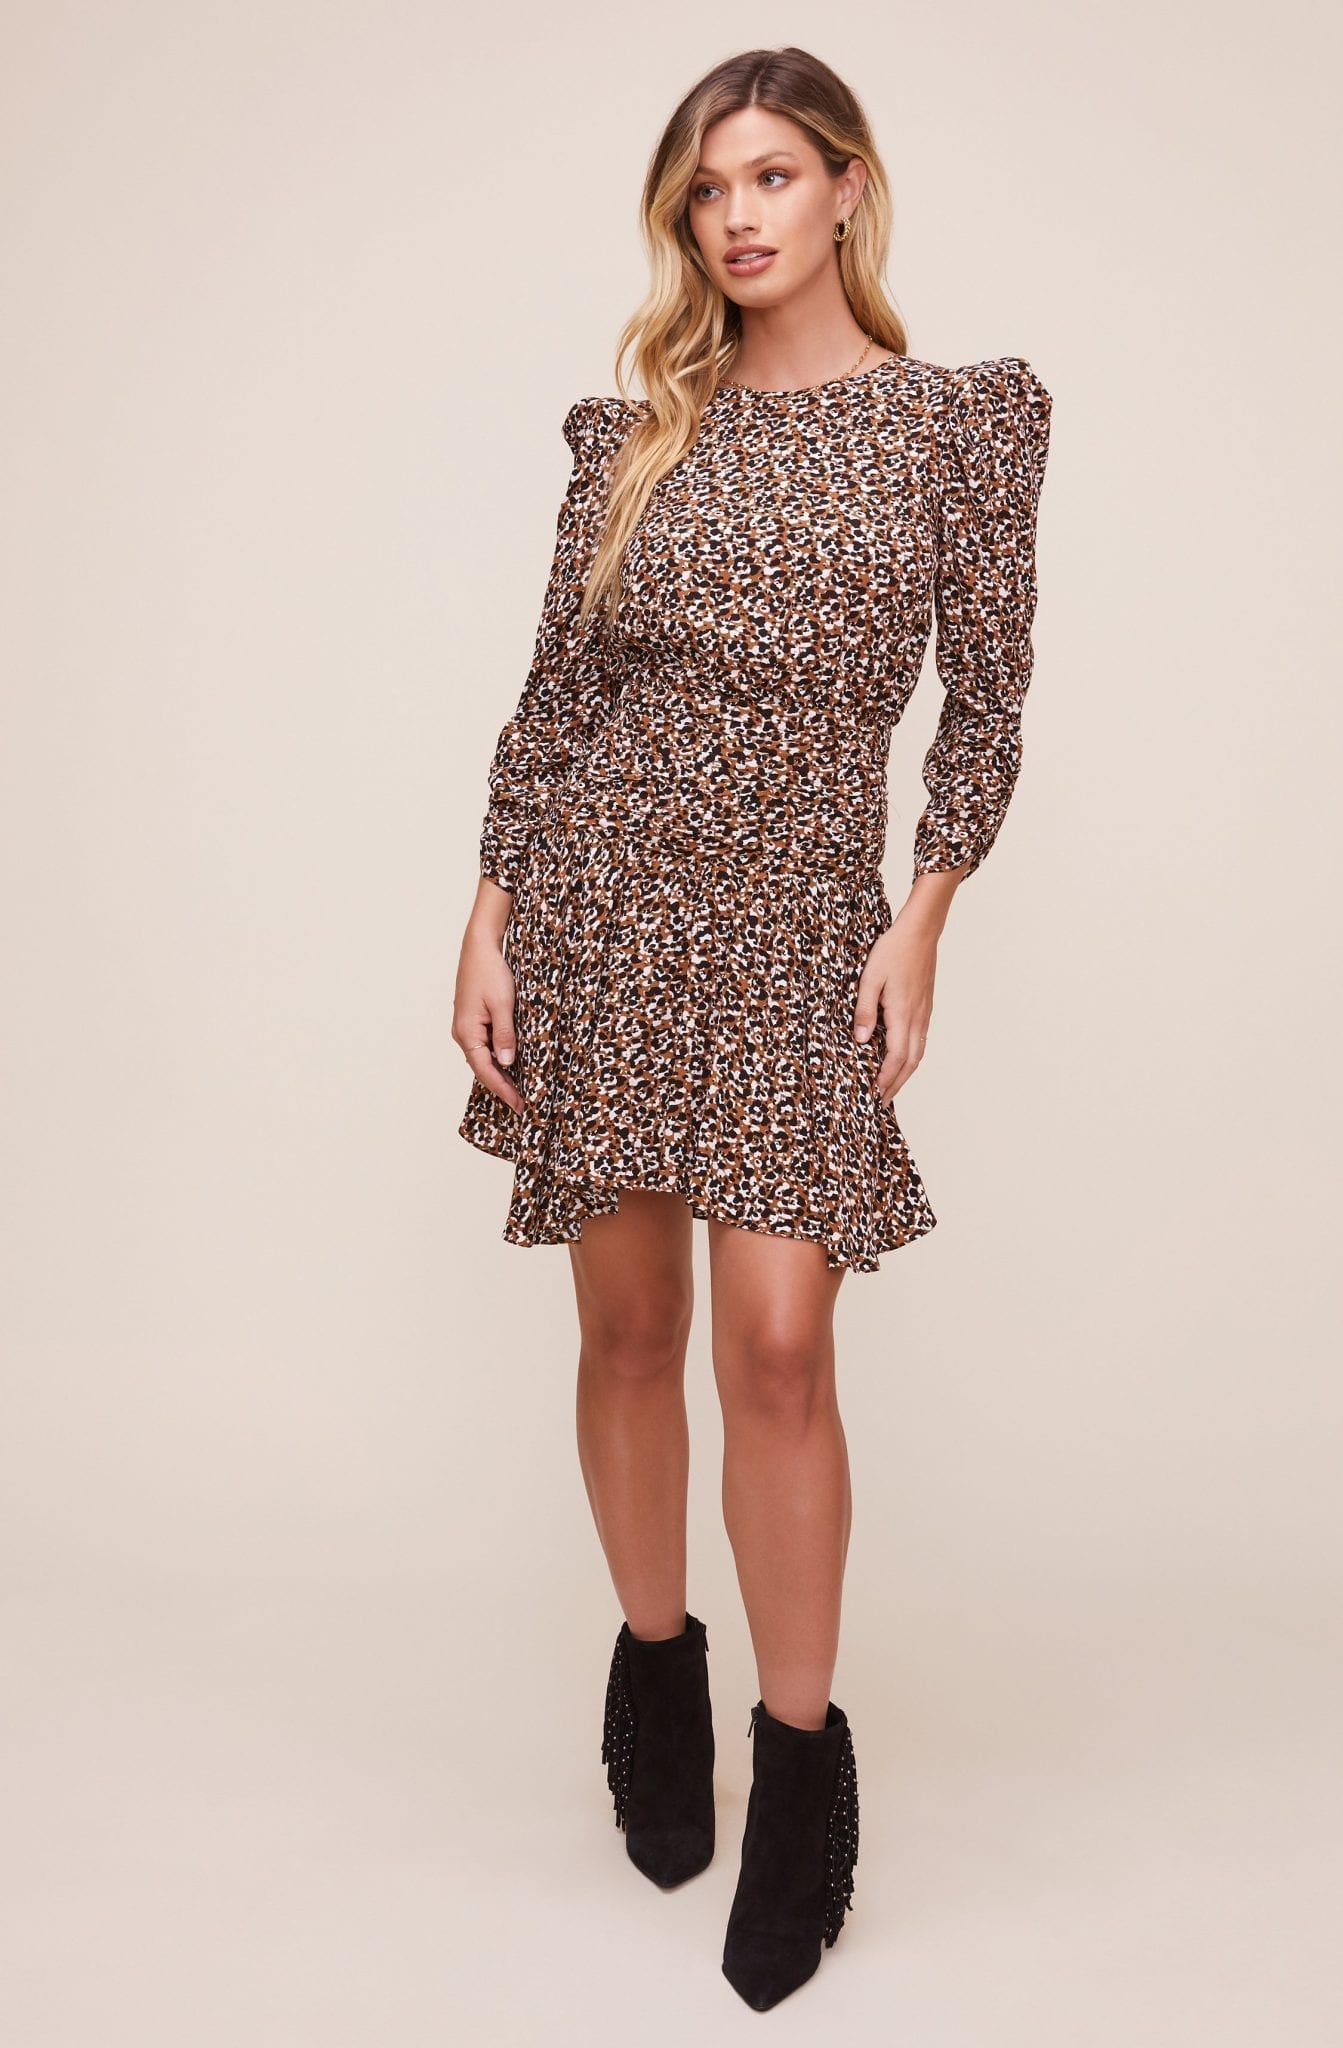 ASTRTHELABEL Savannah Animal Print Dress